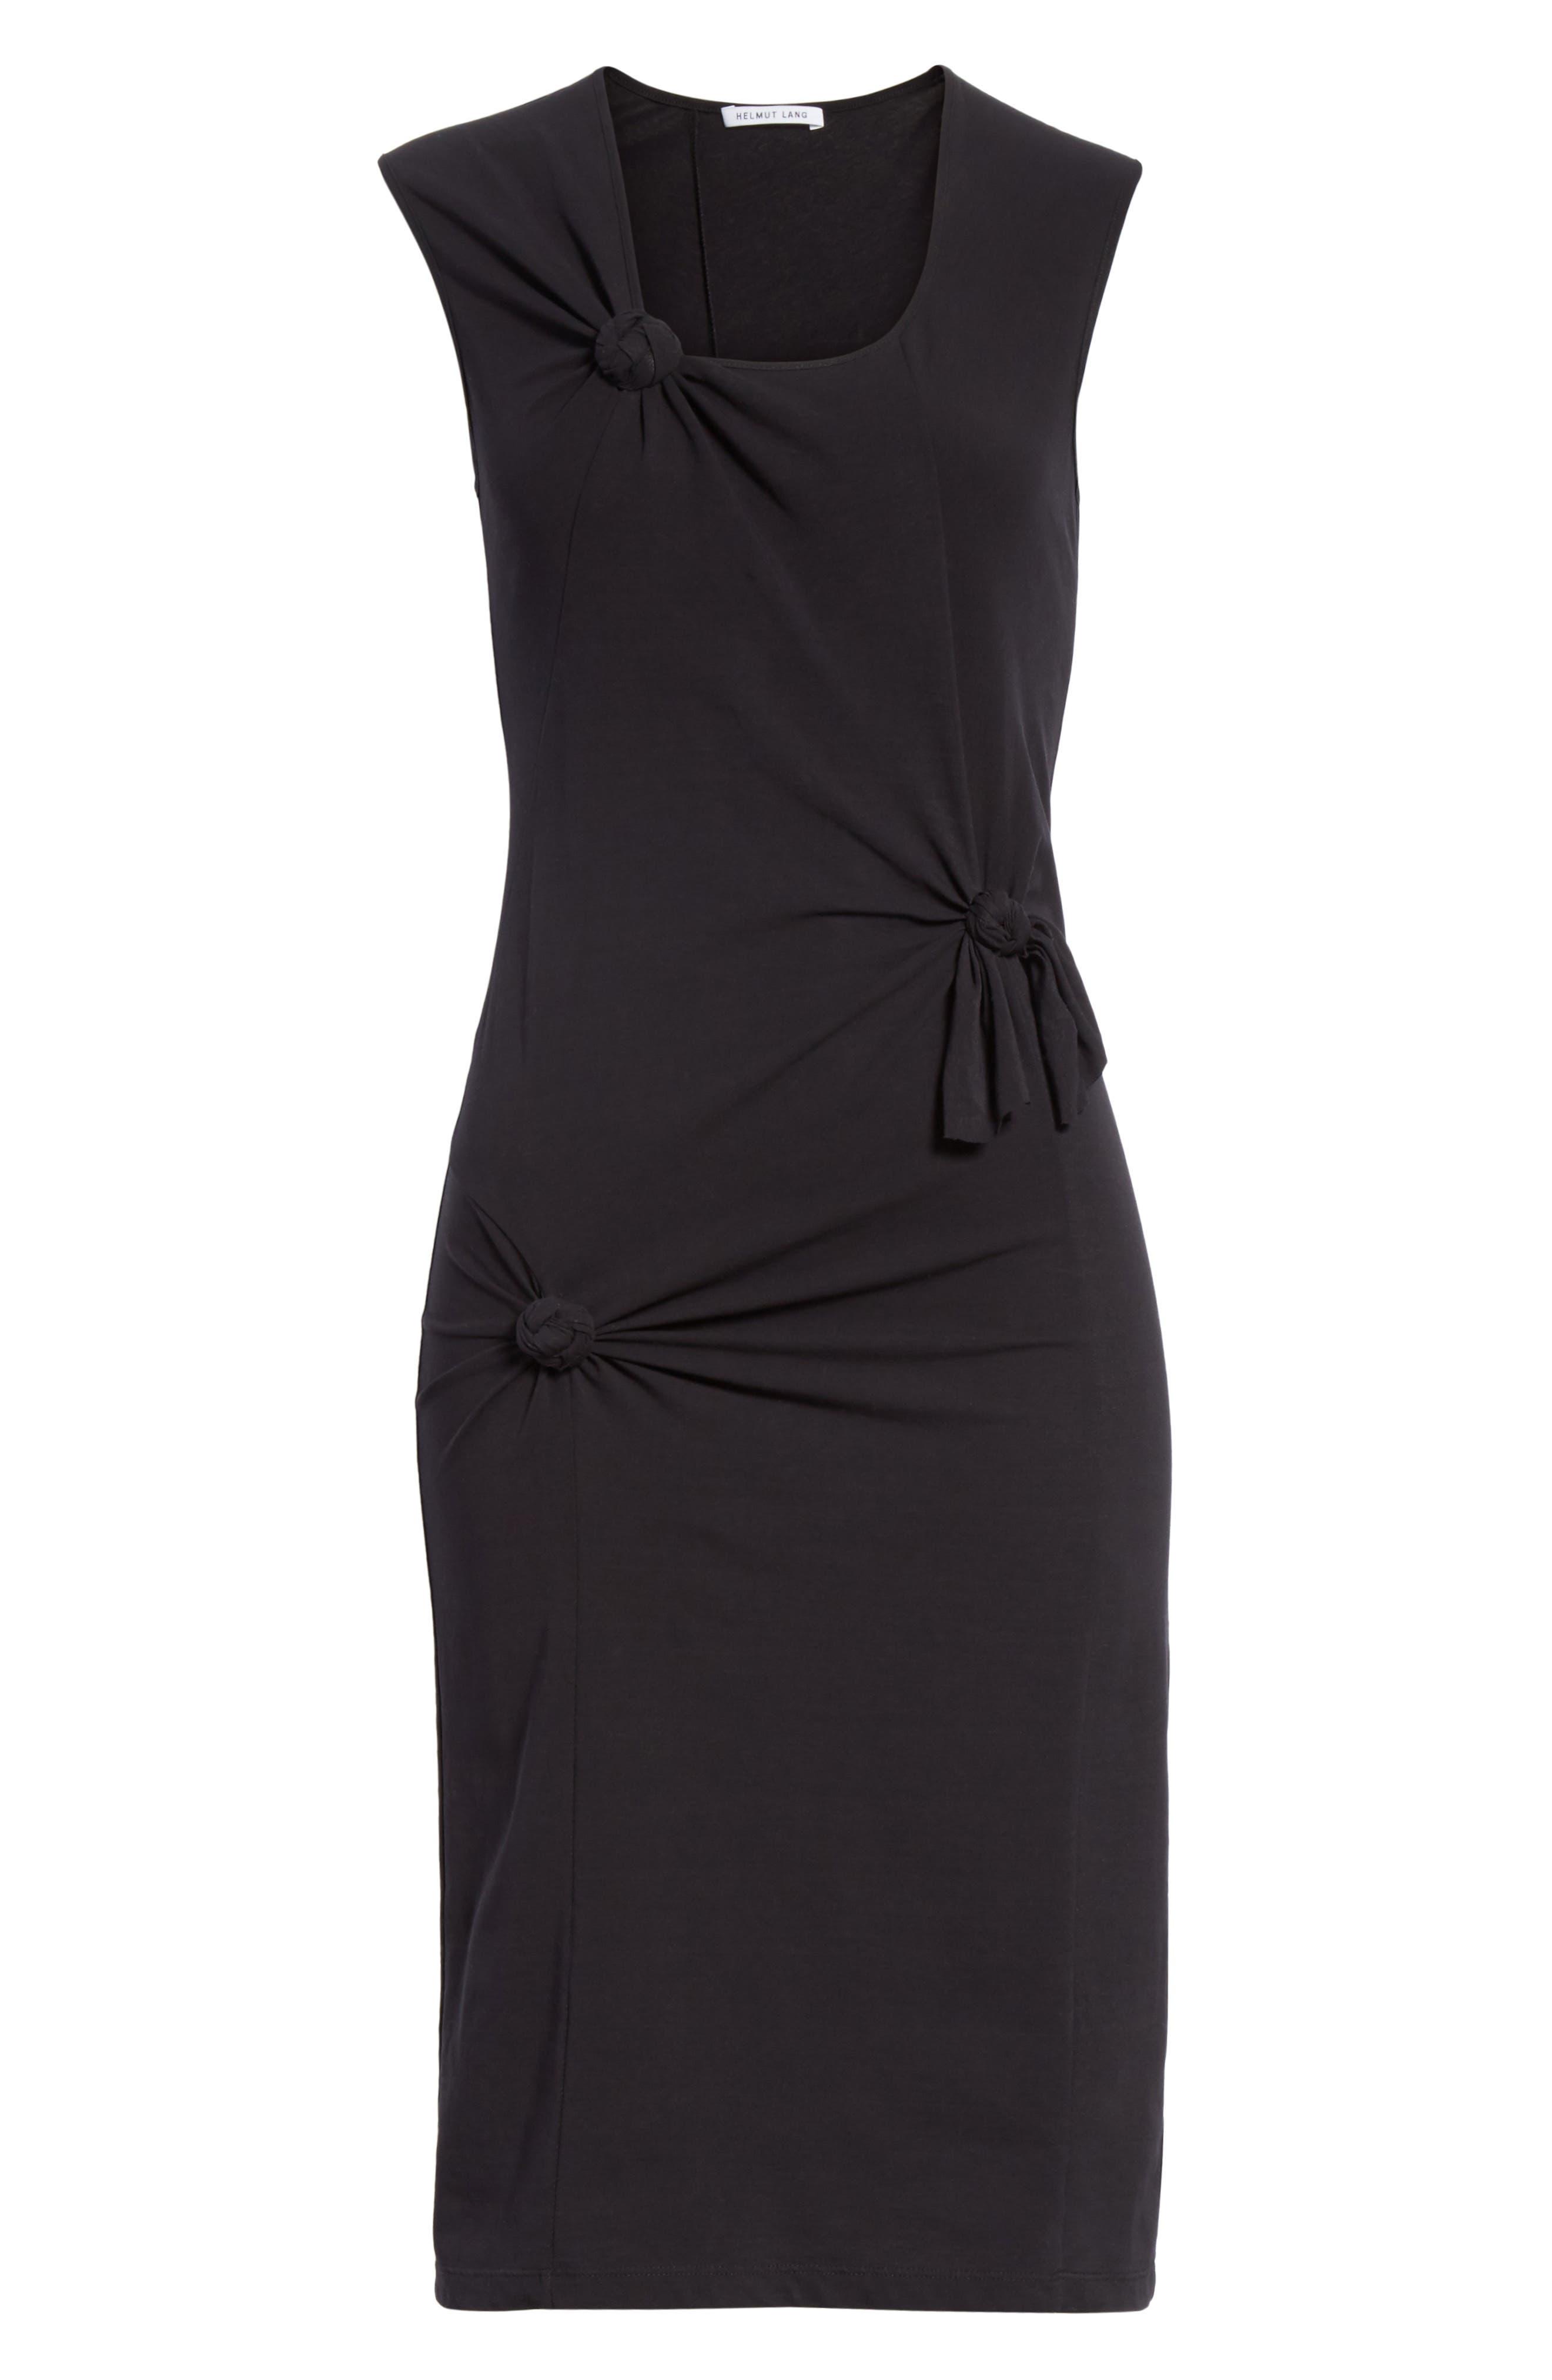 Knot Detail Dress,                             Alternate thumbnail 6, color,                             001